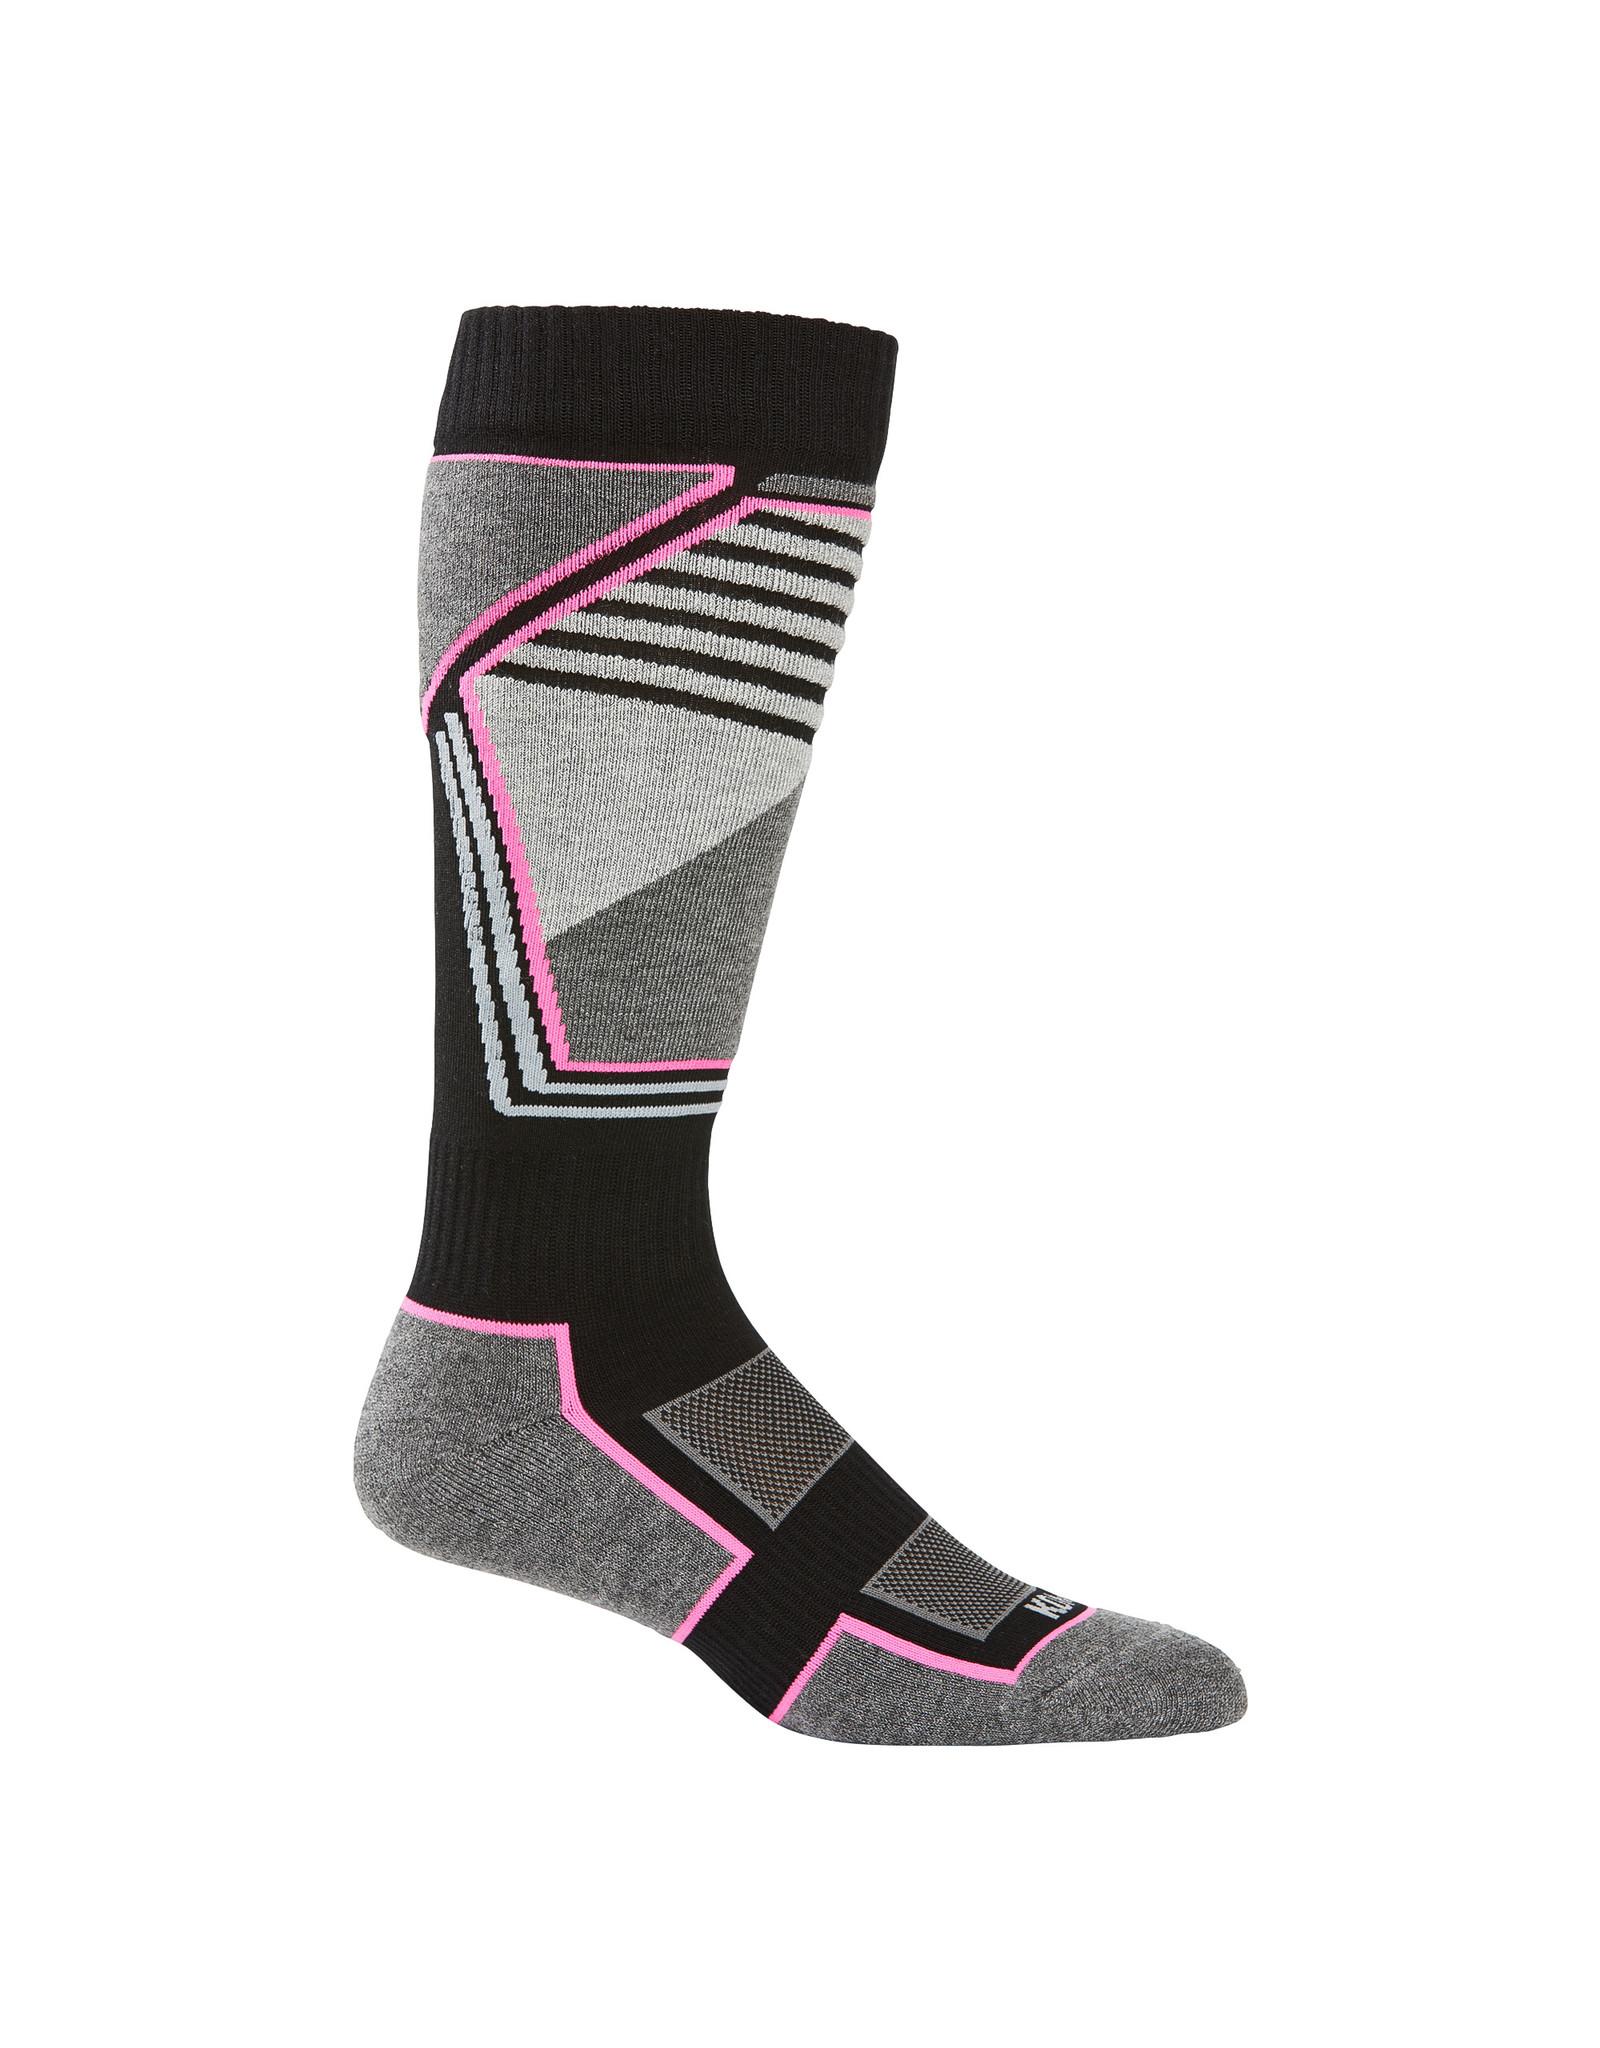 Kombi The Metric Adult Sock